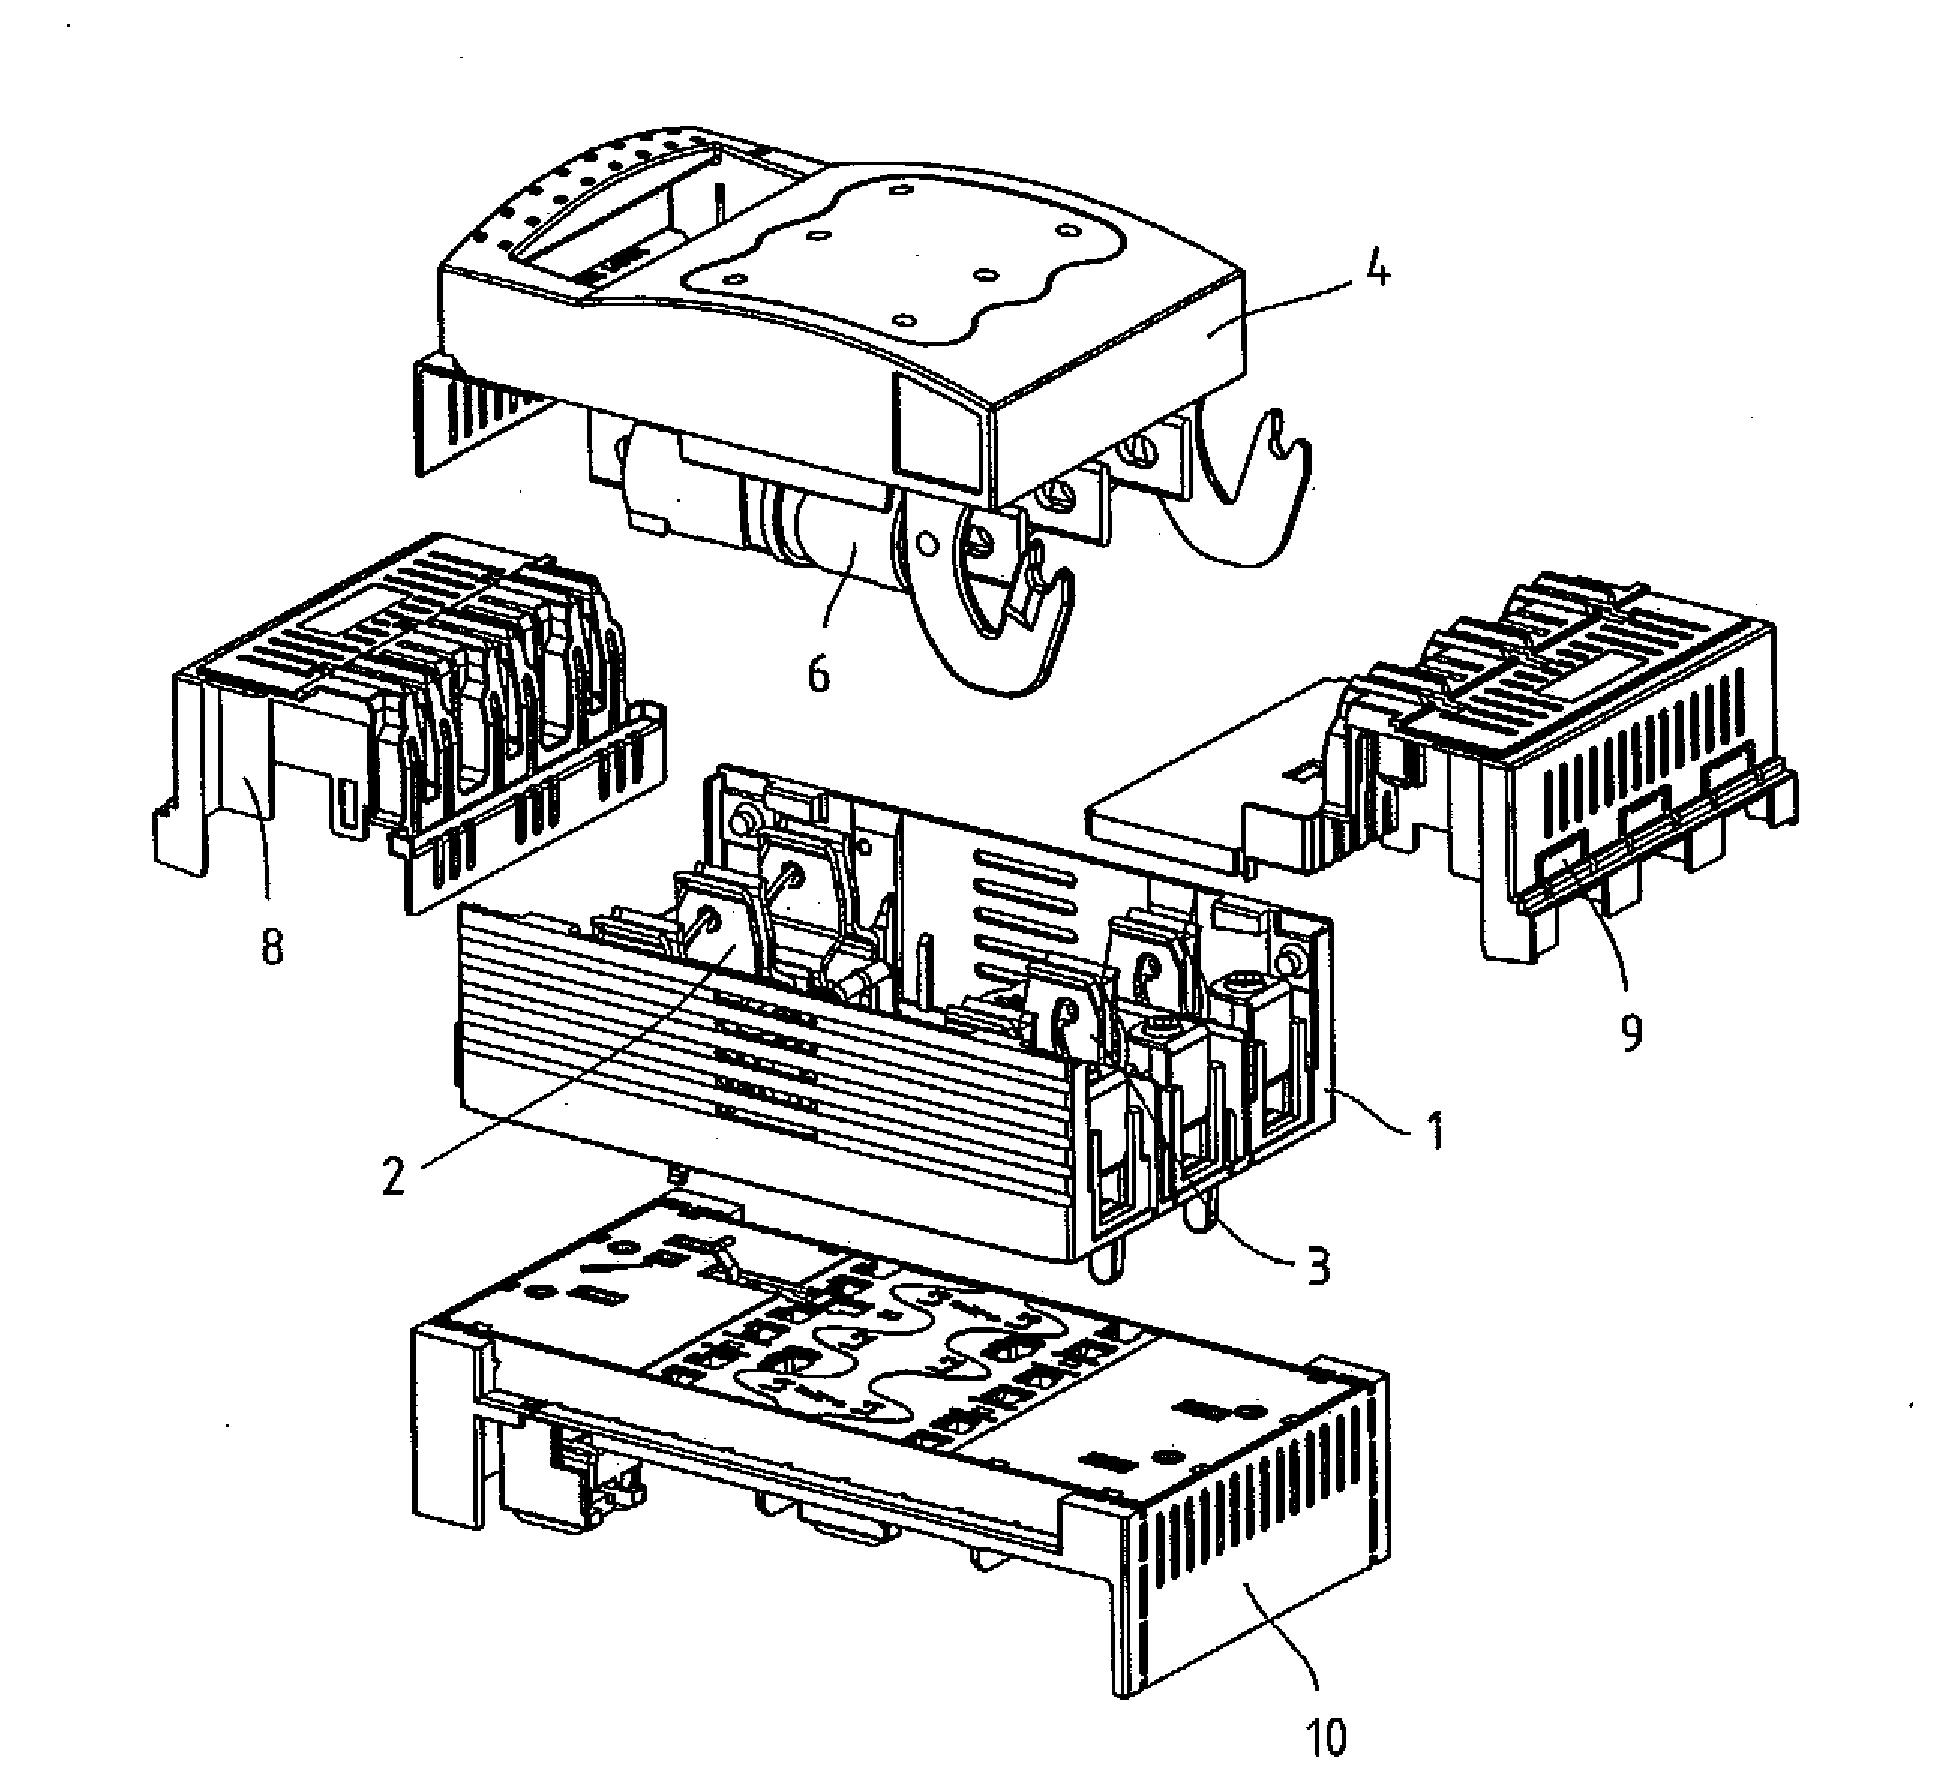 Duramax Sel Parts Diagram Duramax Free Engine Image For